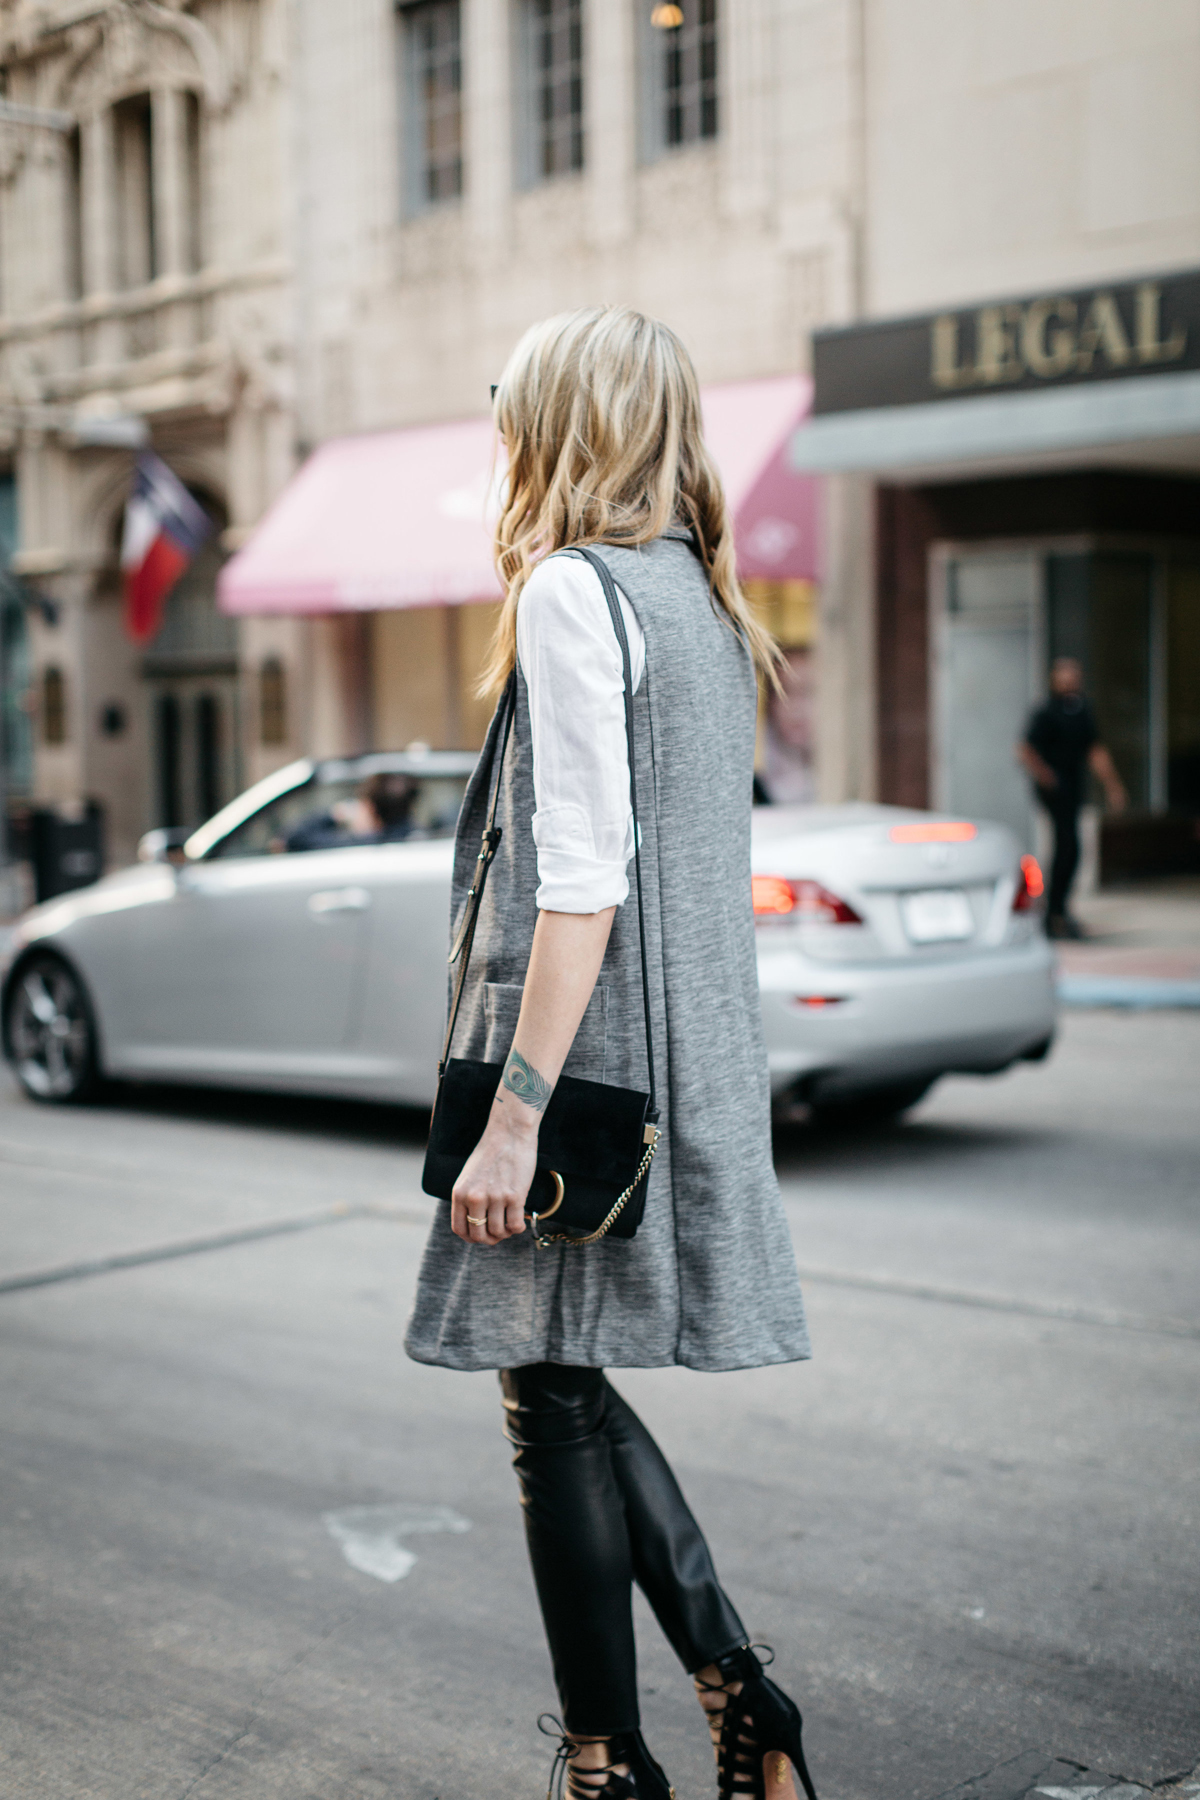 Fall Outfit, Winter Outfit, White Button-Down Shirt, Long Grey Vest, Faux Leather Black Pants, Chloe Faye Handbag